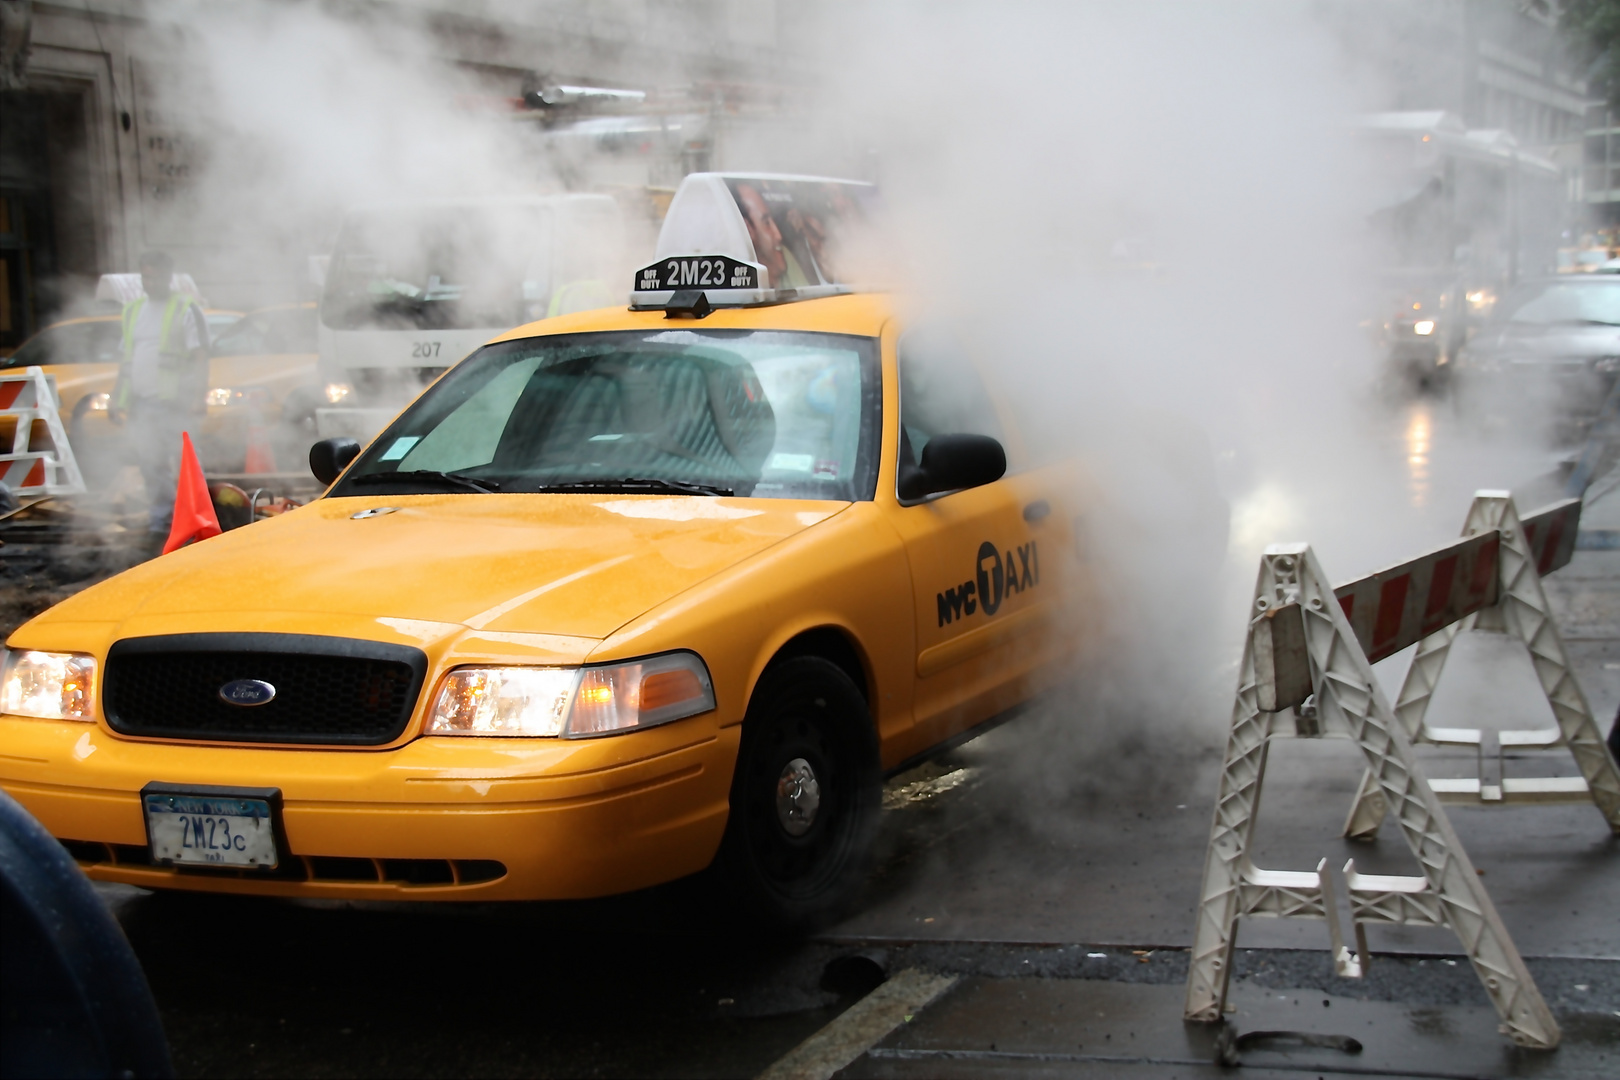 Taxi im Dunst